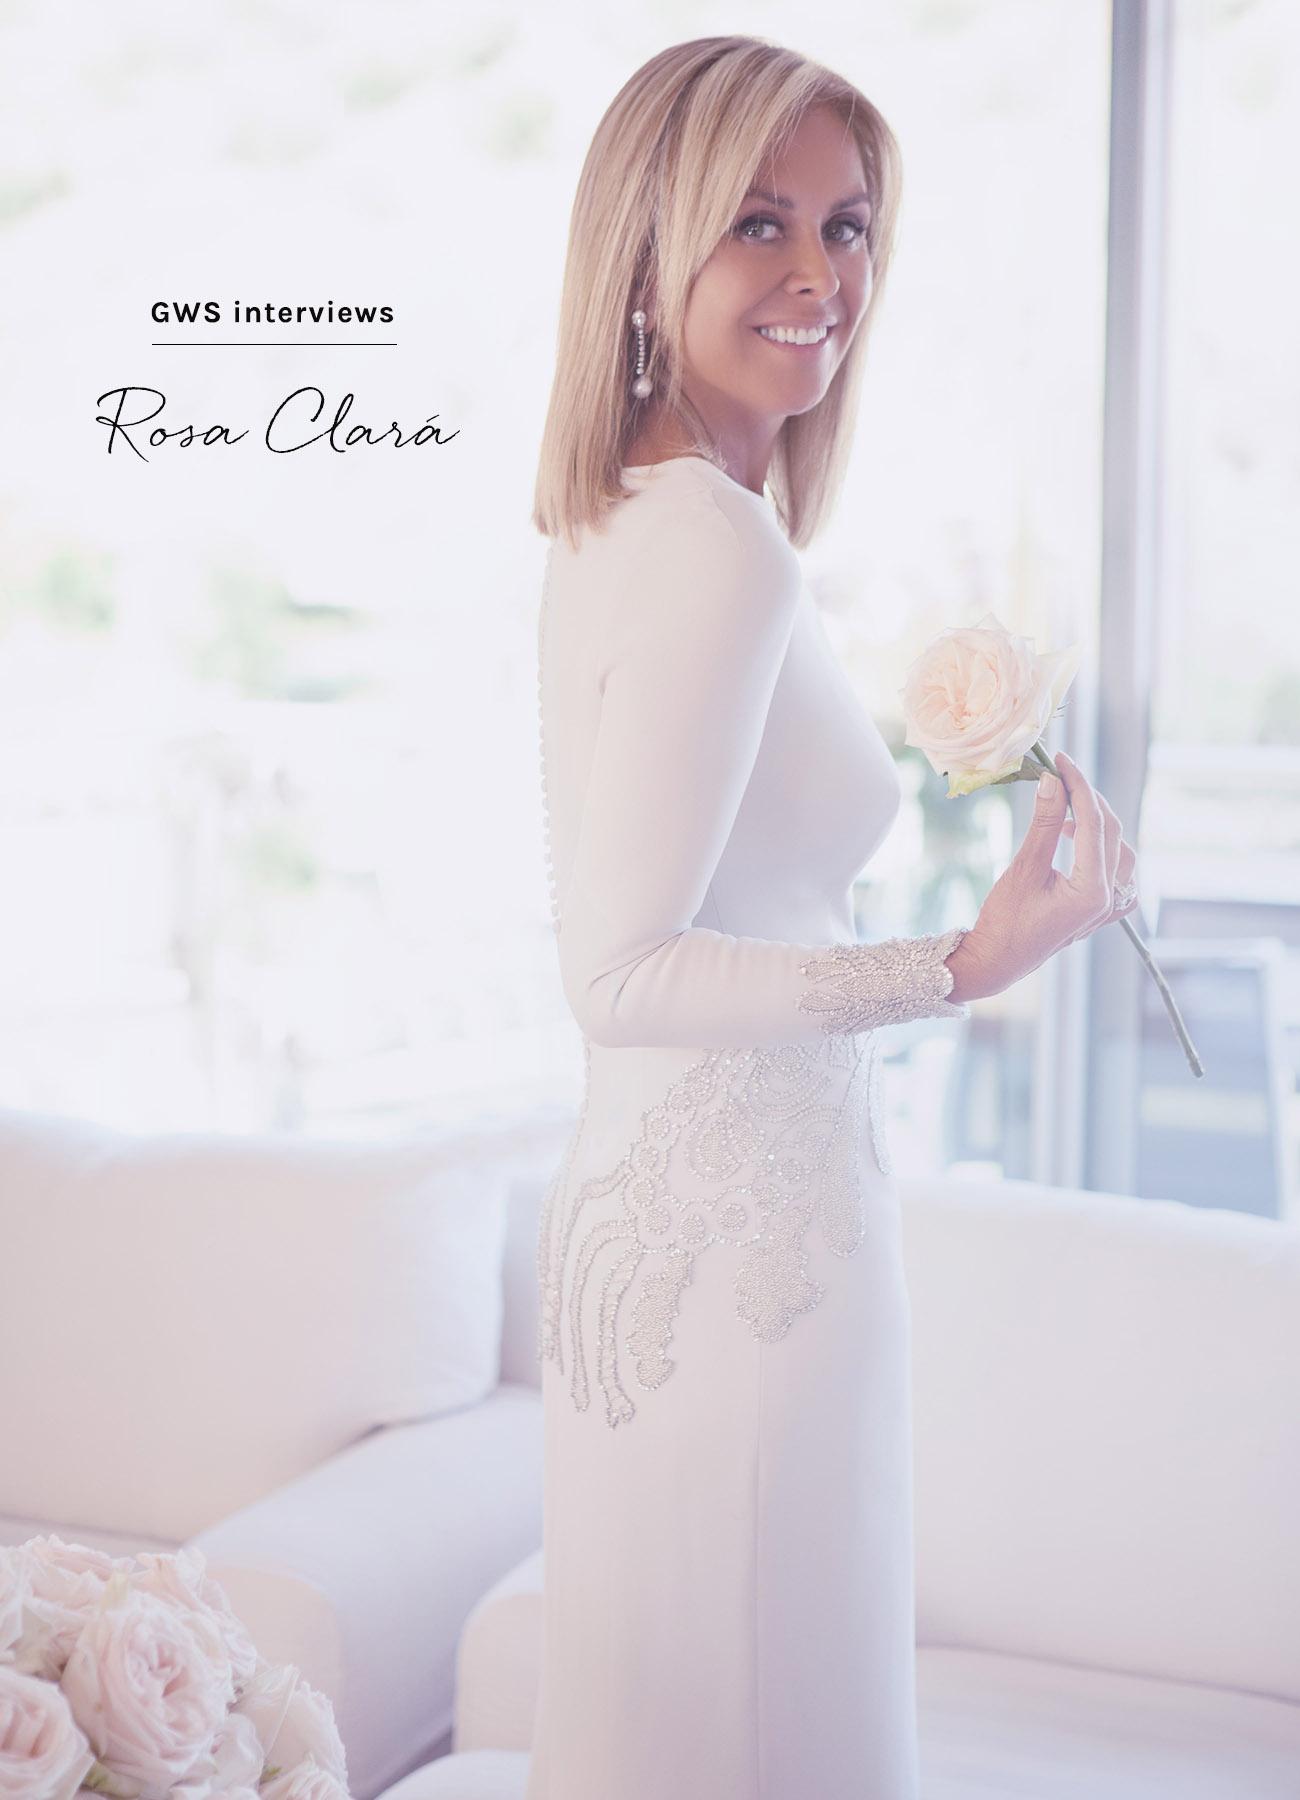 Rosa Clara Interview